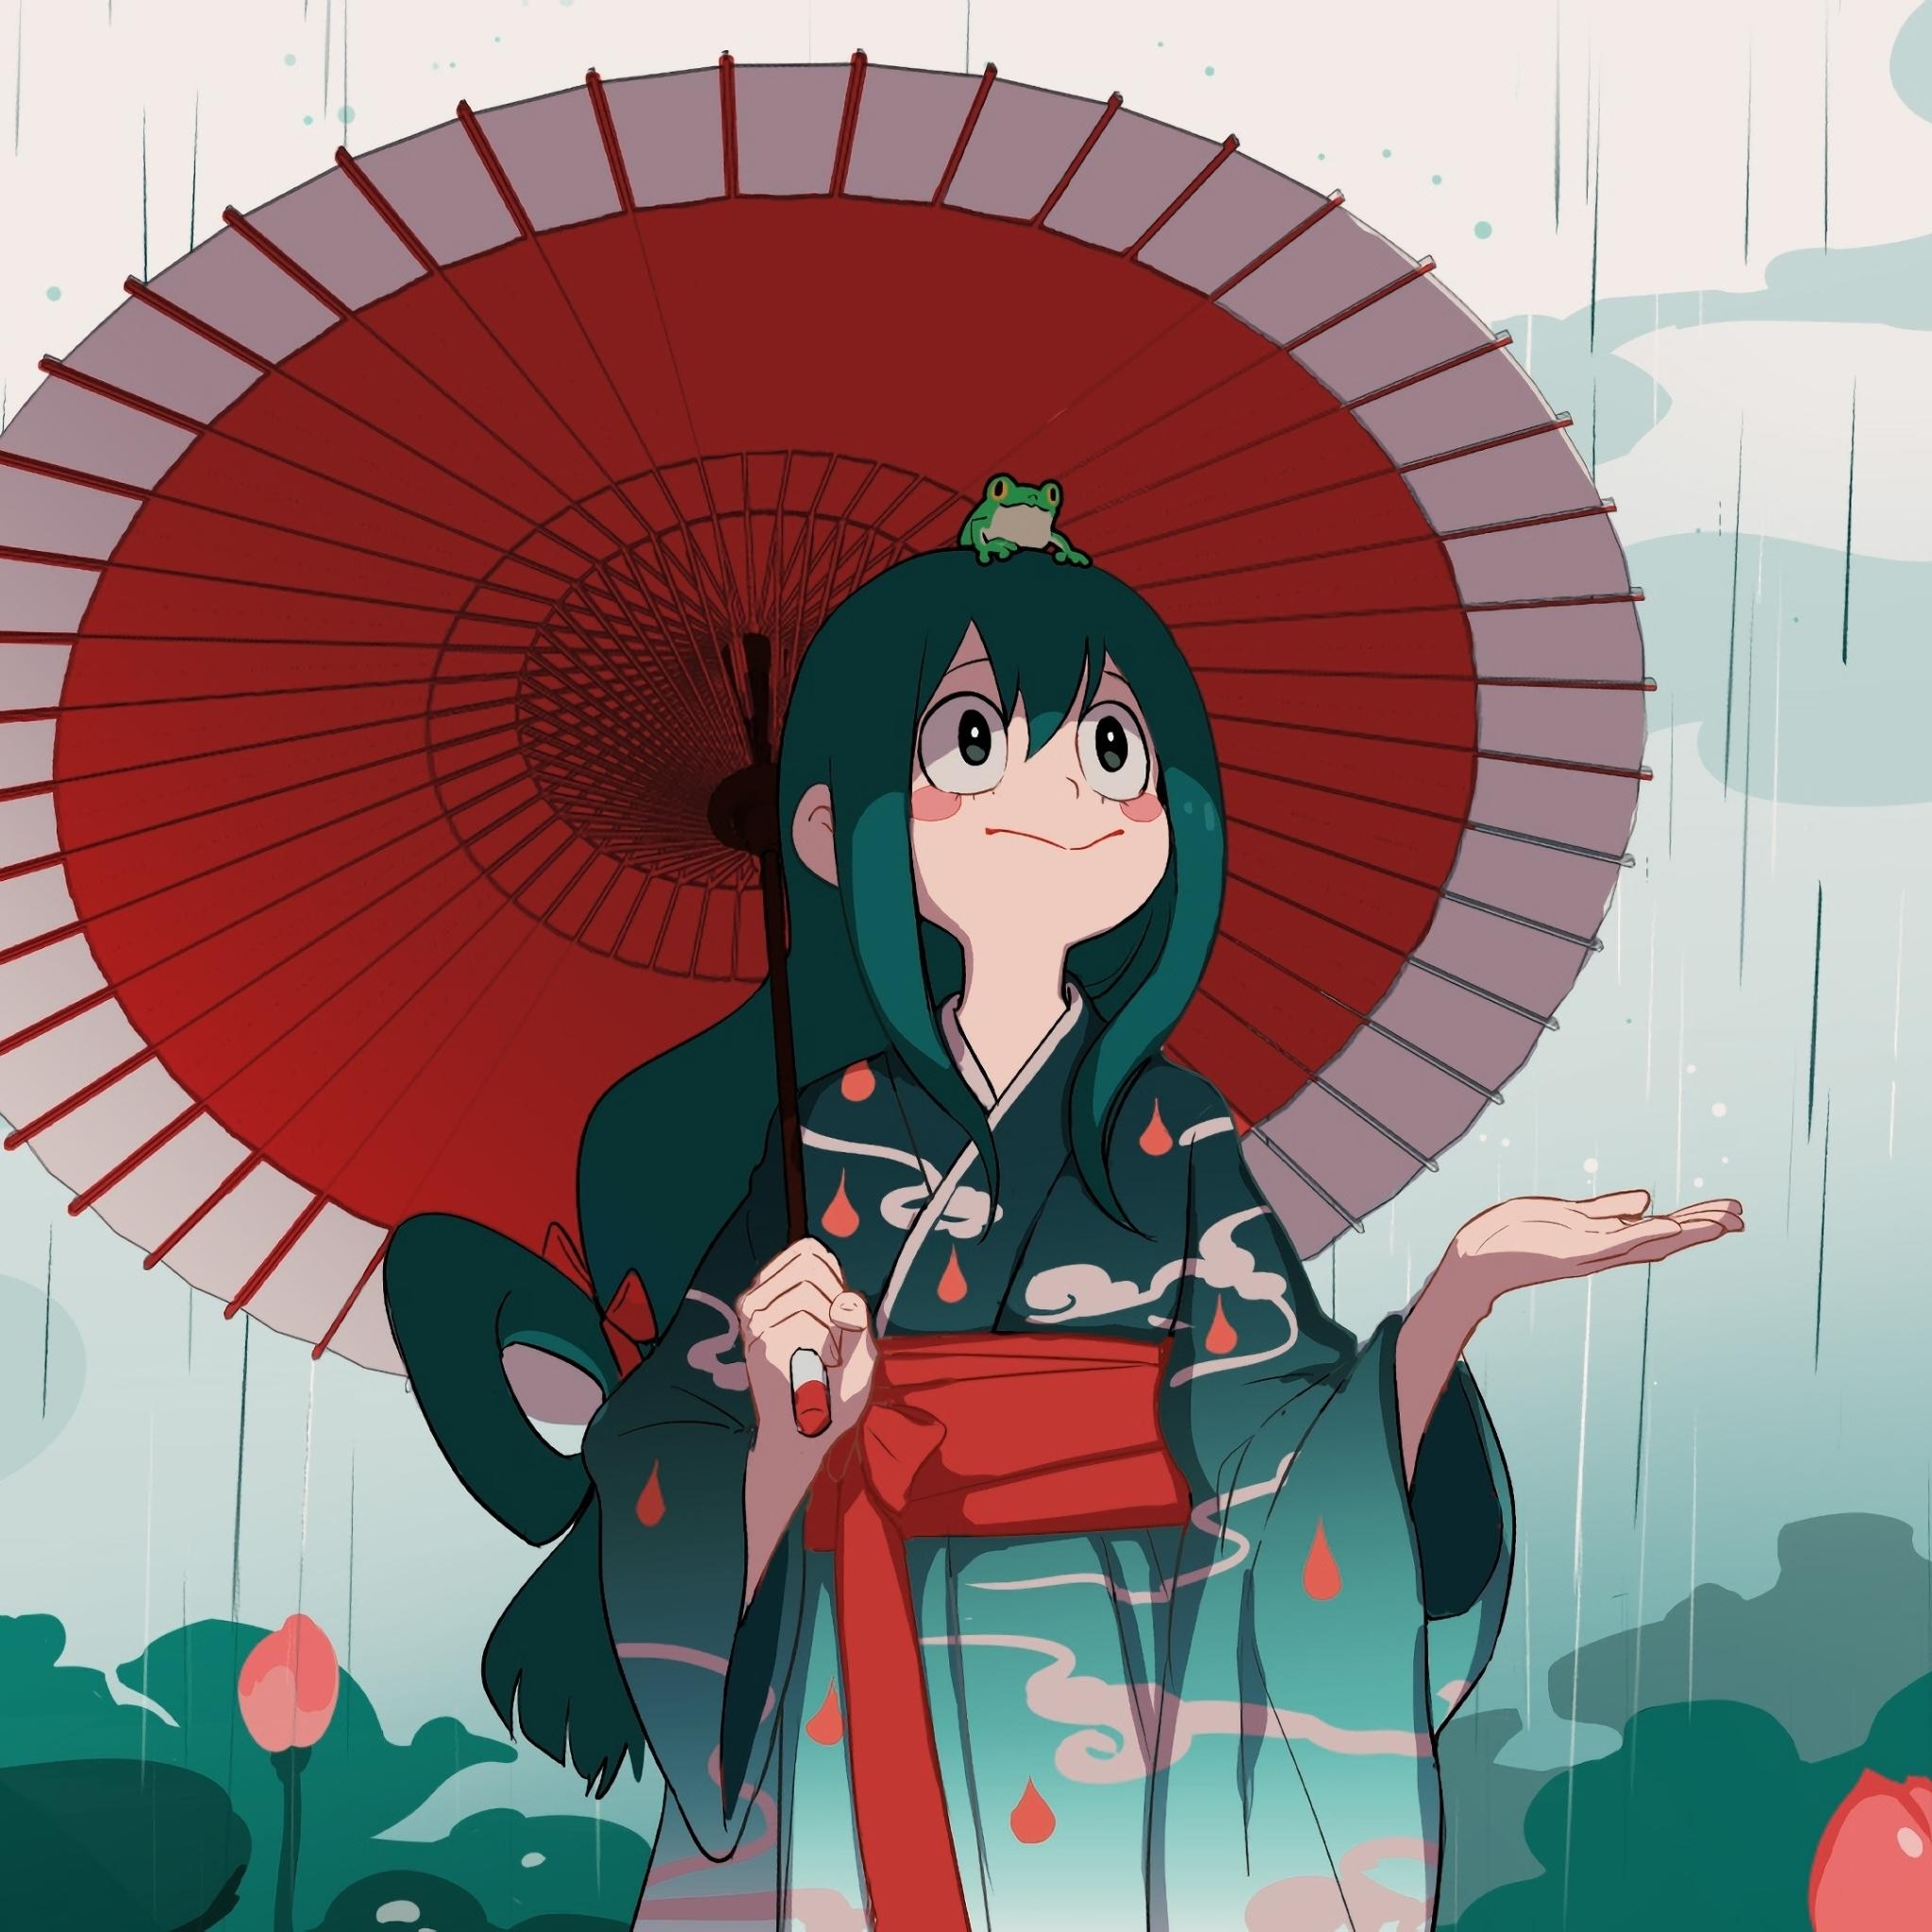 2048x2048 Tsuyu Asui Art Ipad Air Wallpaper Hd Anime 4k